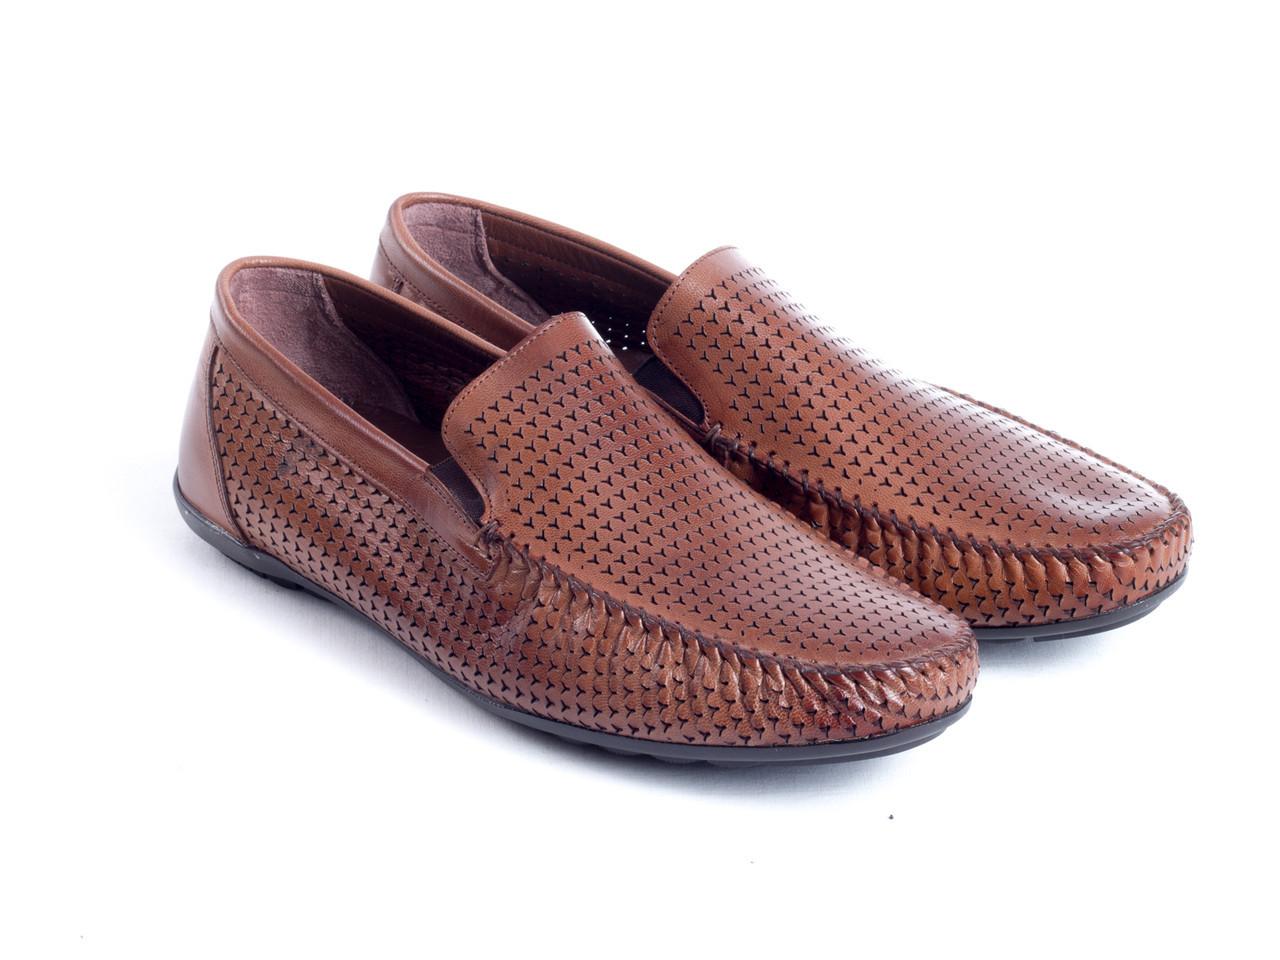 Мокасины Etor 10431-8934-1 41 коричневые